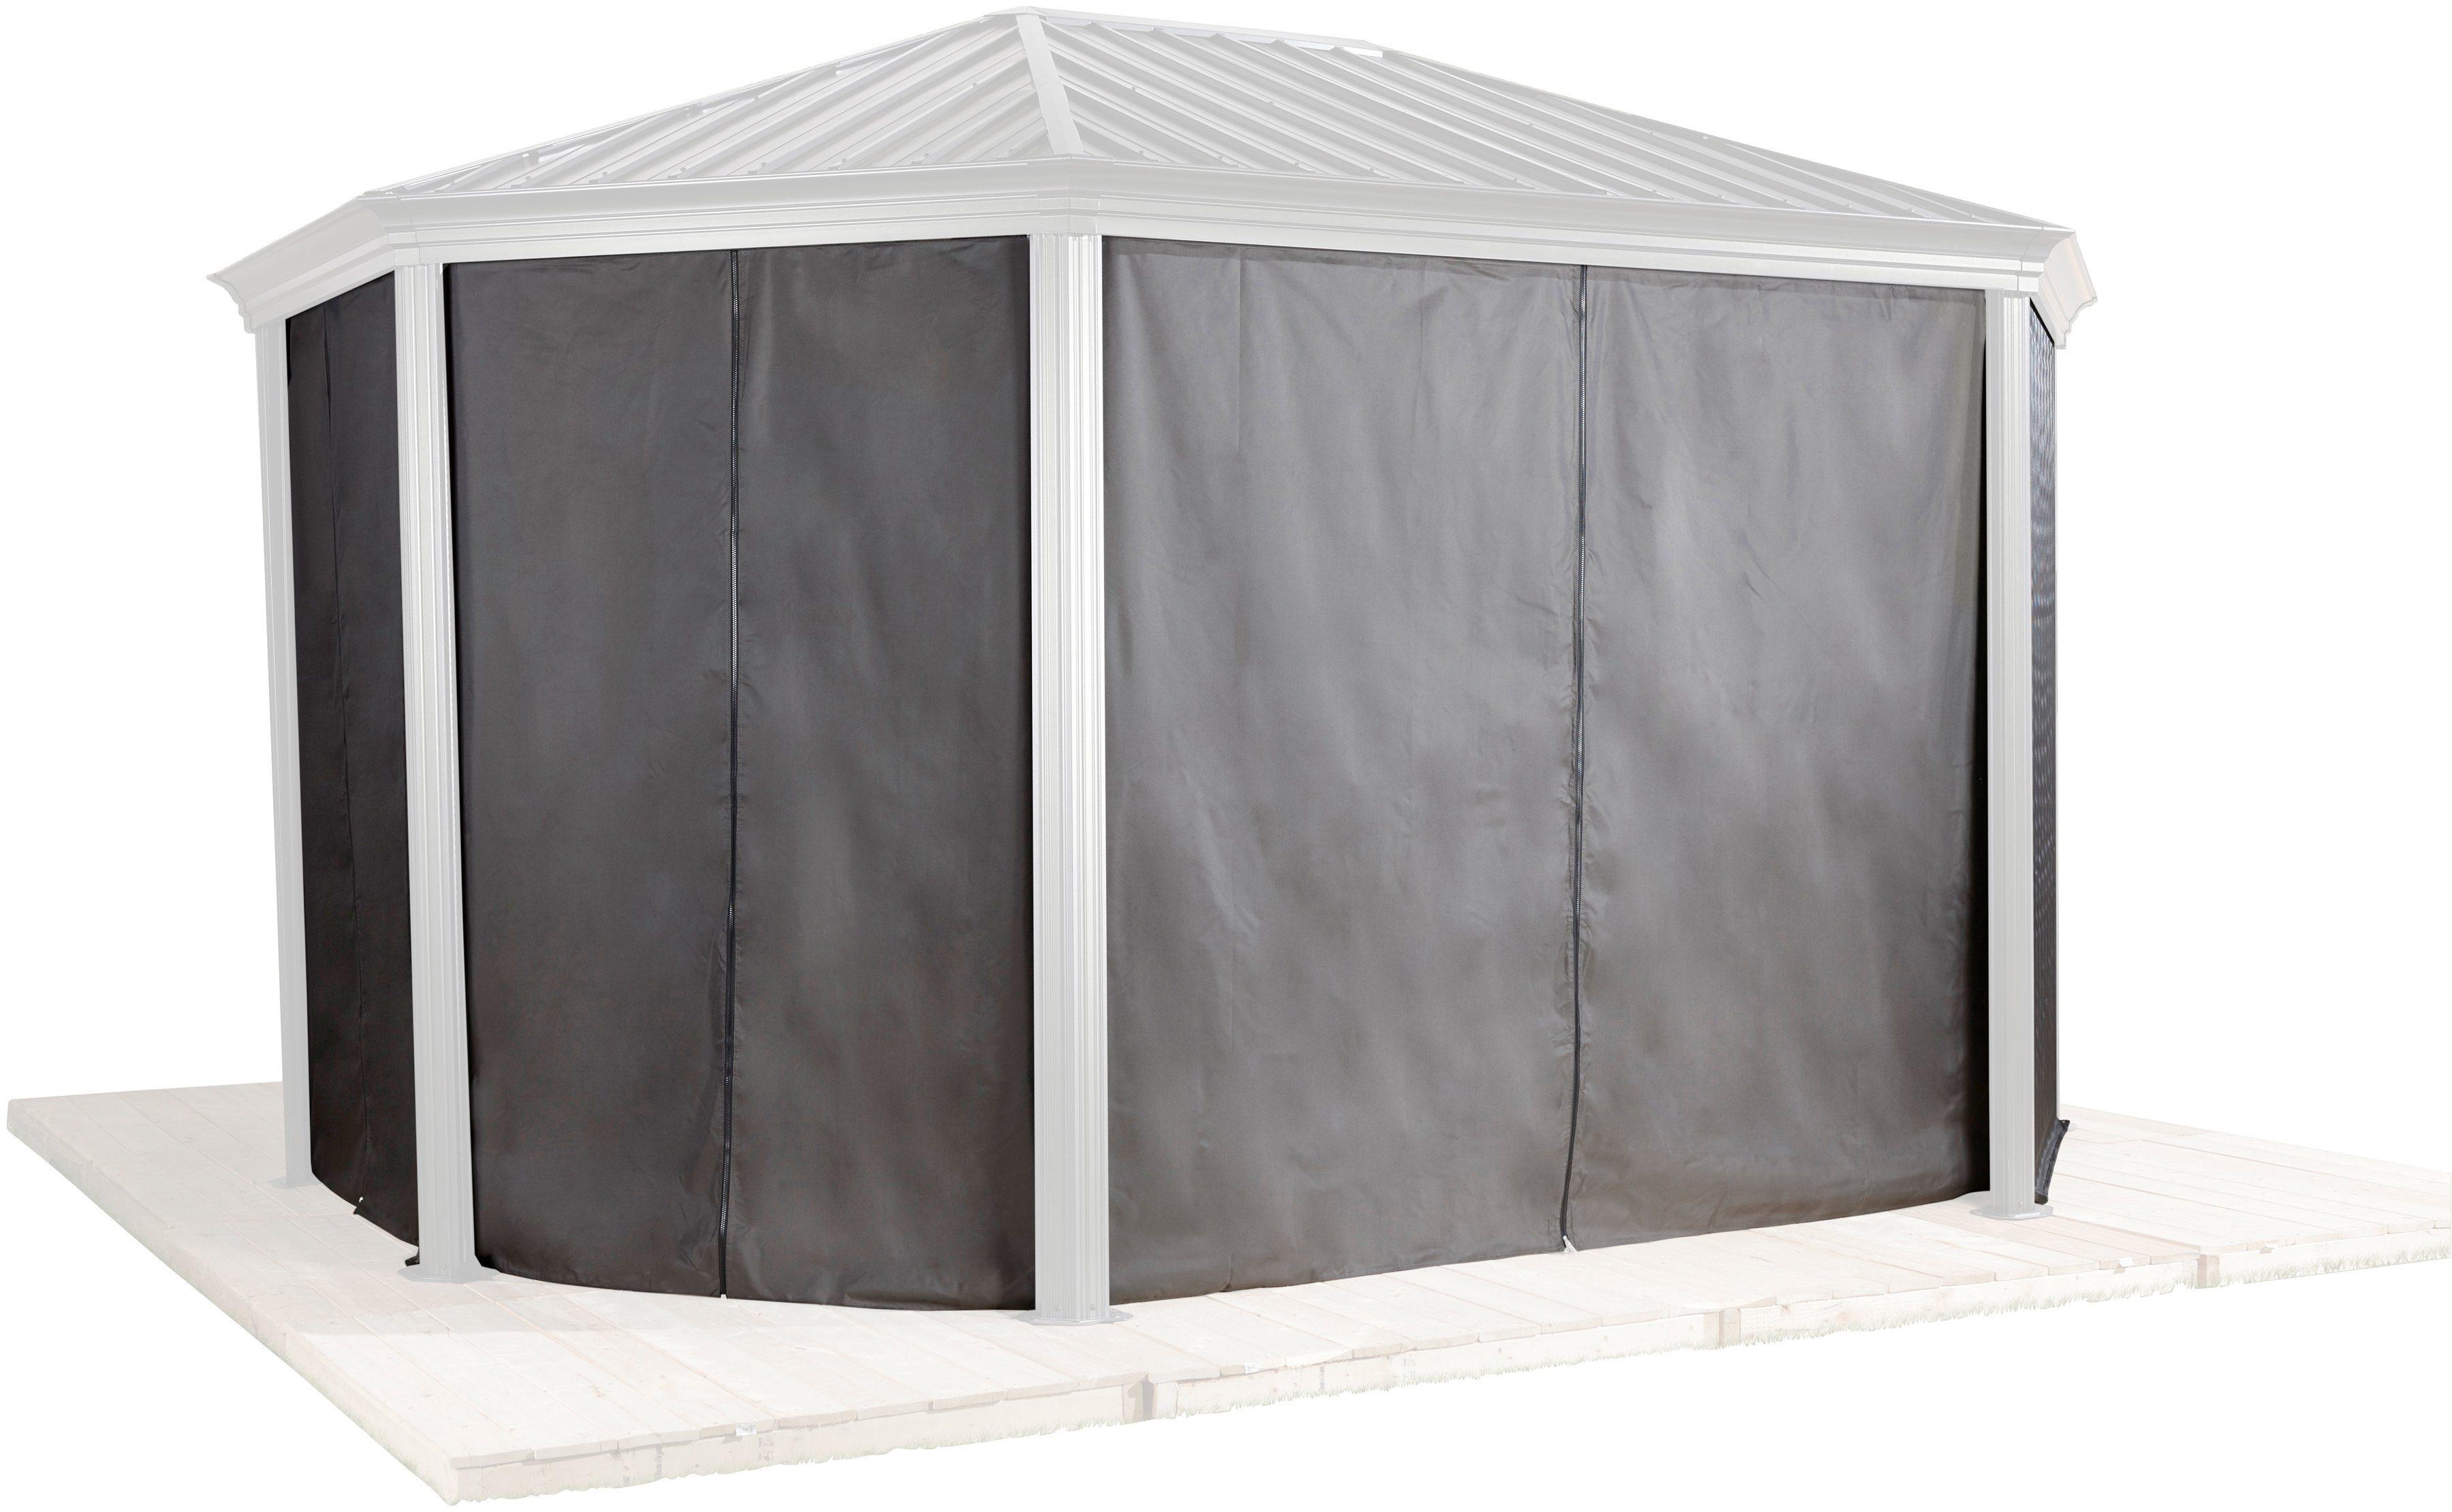 Seitenteile für Pavillon »Komodo 12x18«, 4 Stk.   Garten > Pavillons   CLEMENS HOBBY TEC